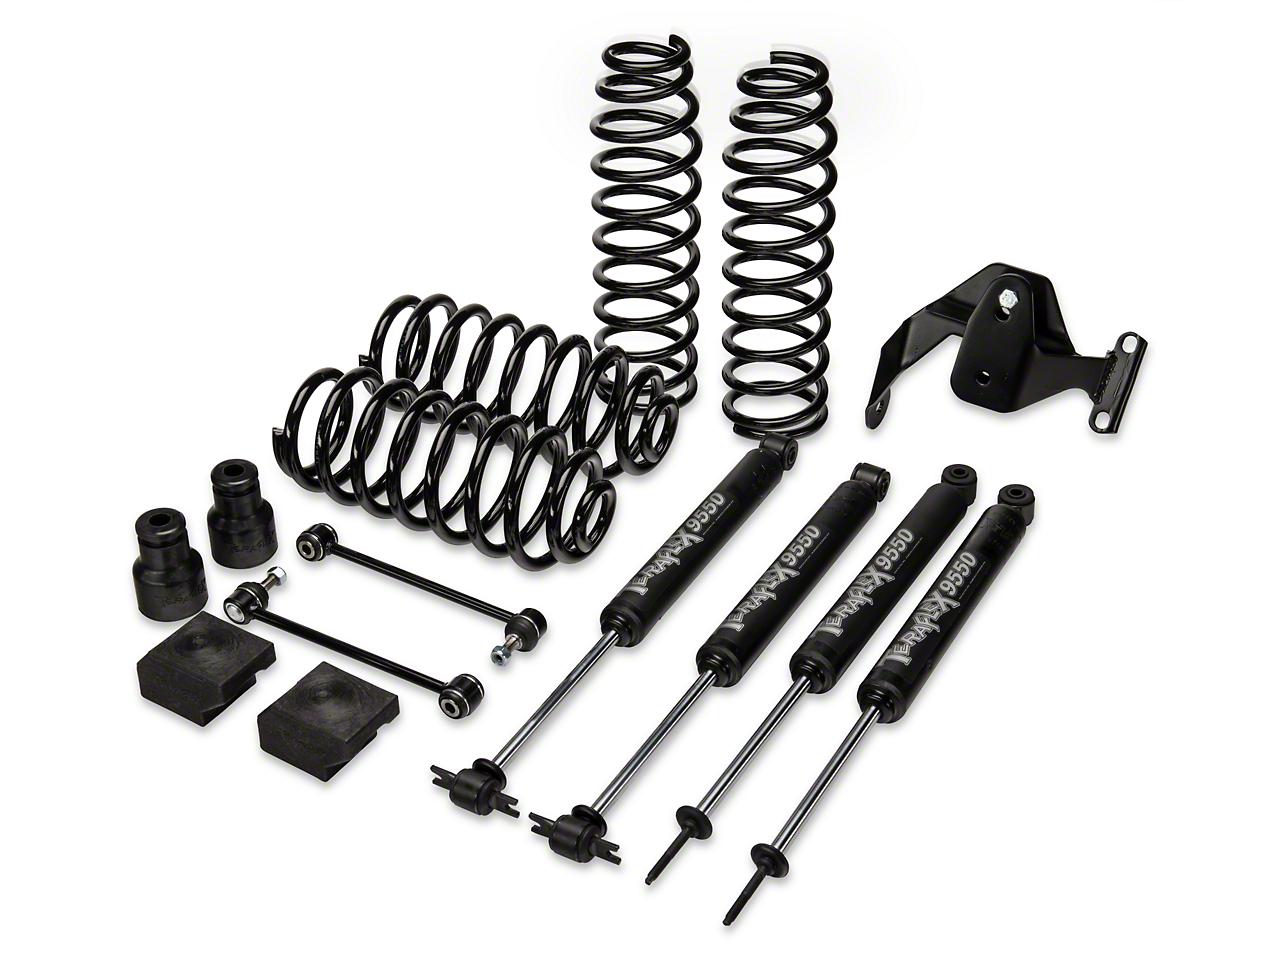 Teraflex 2.5 in. Lift Kit w/ Shocks (07-17 Wrangler JK 2 Door)